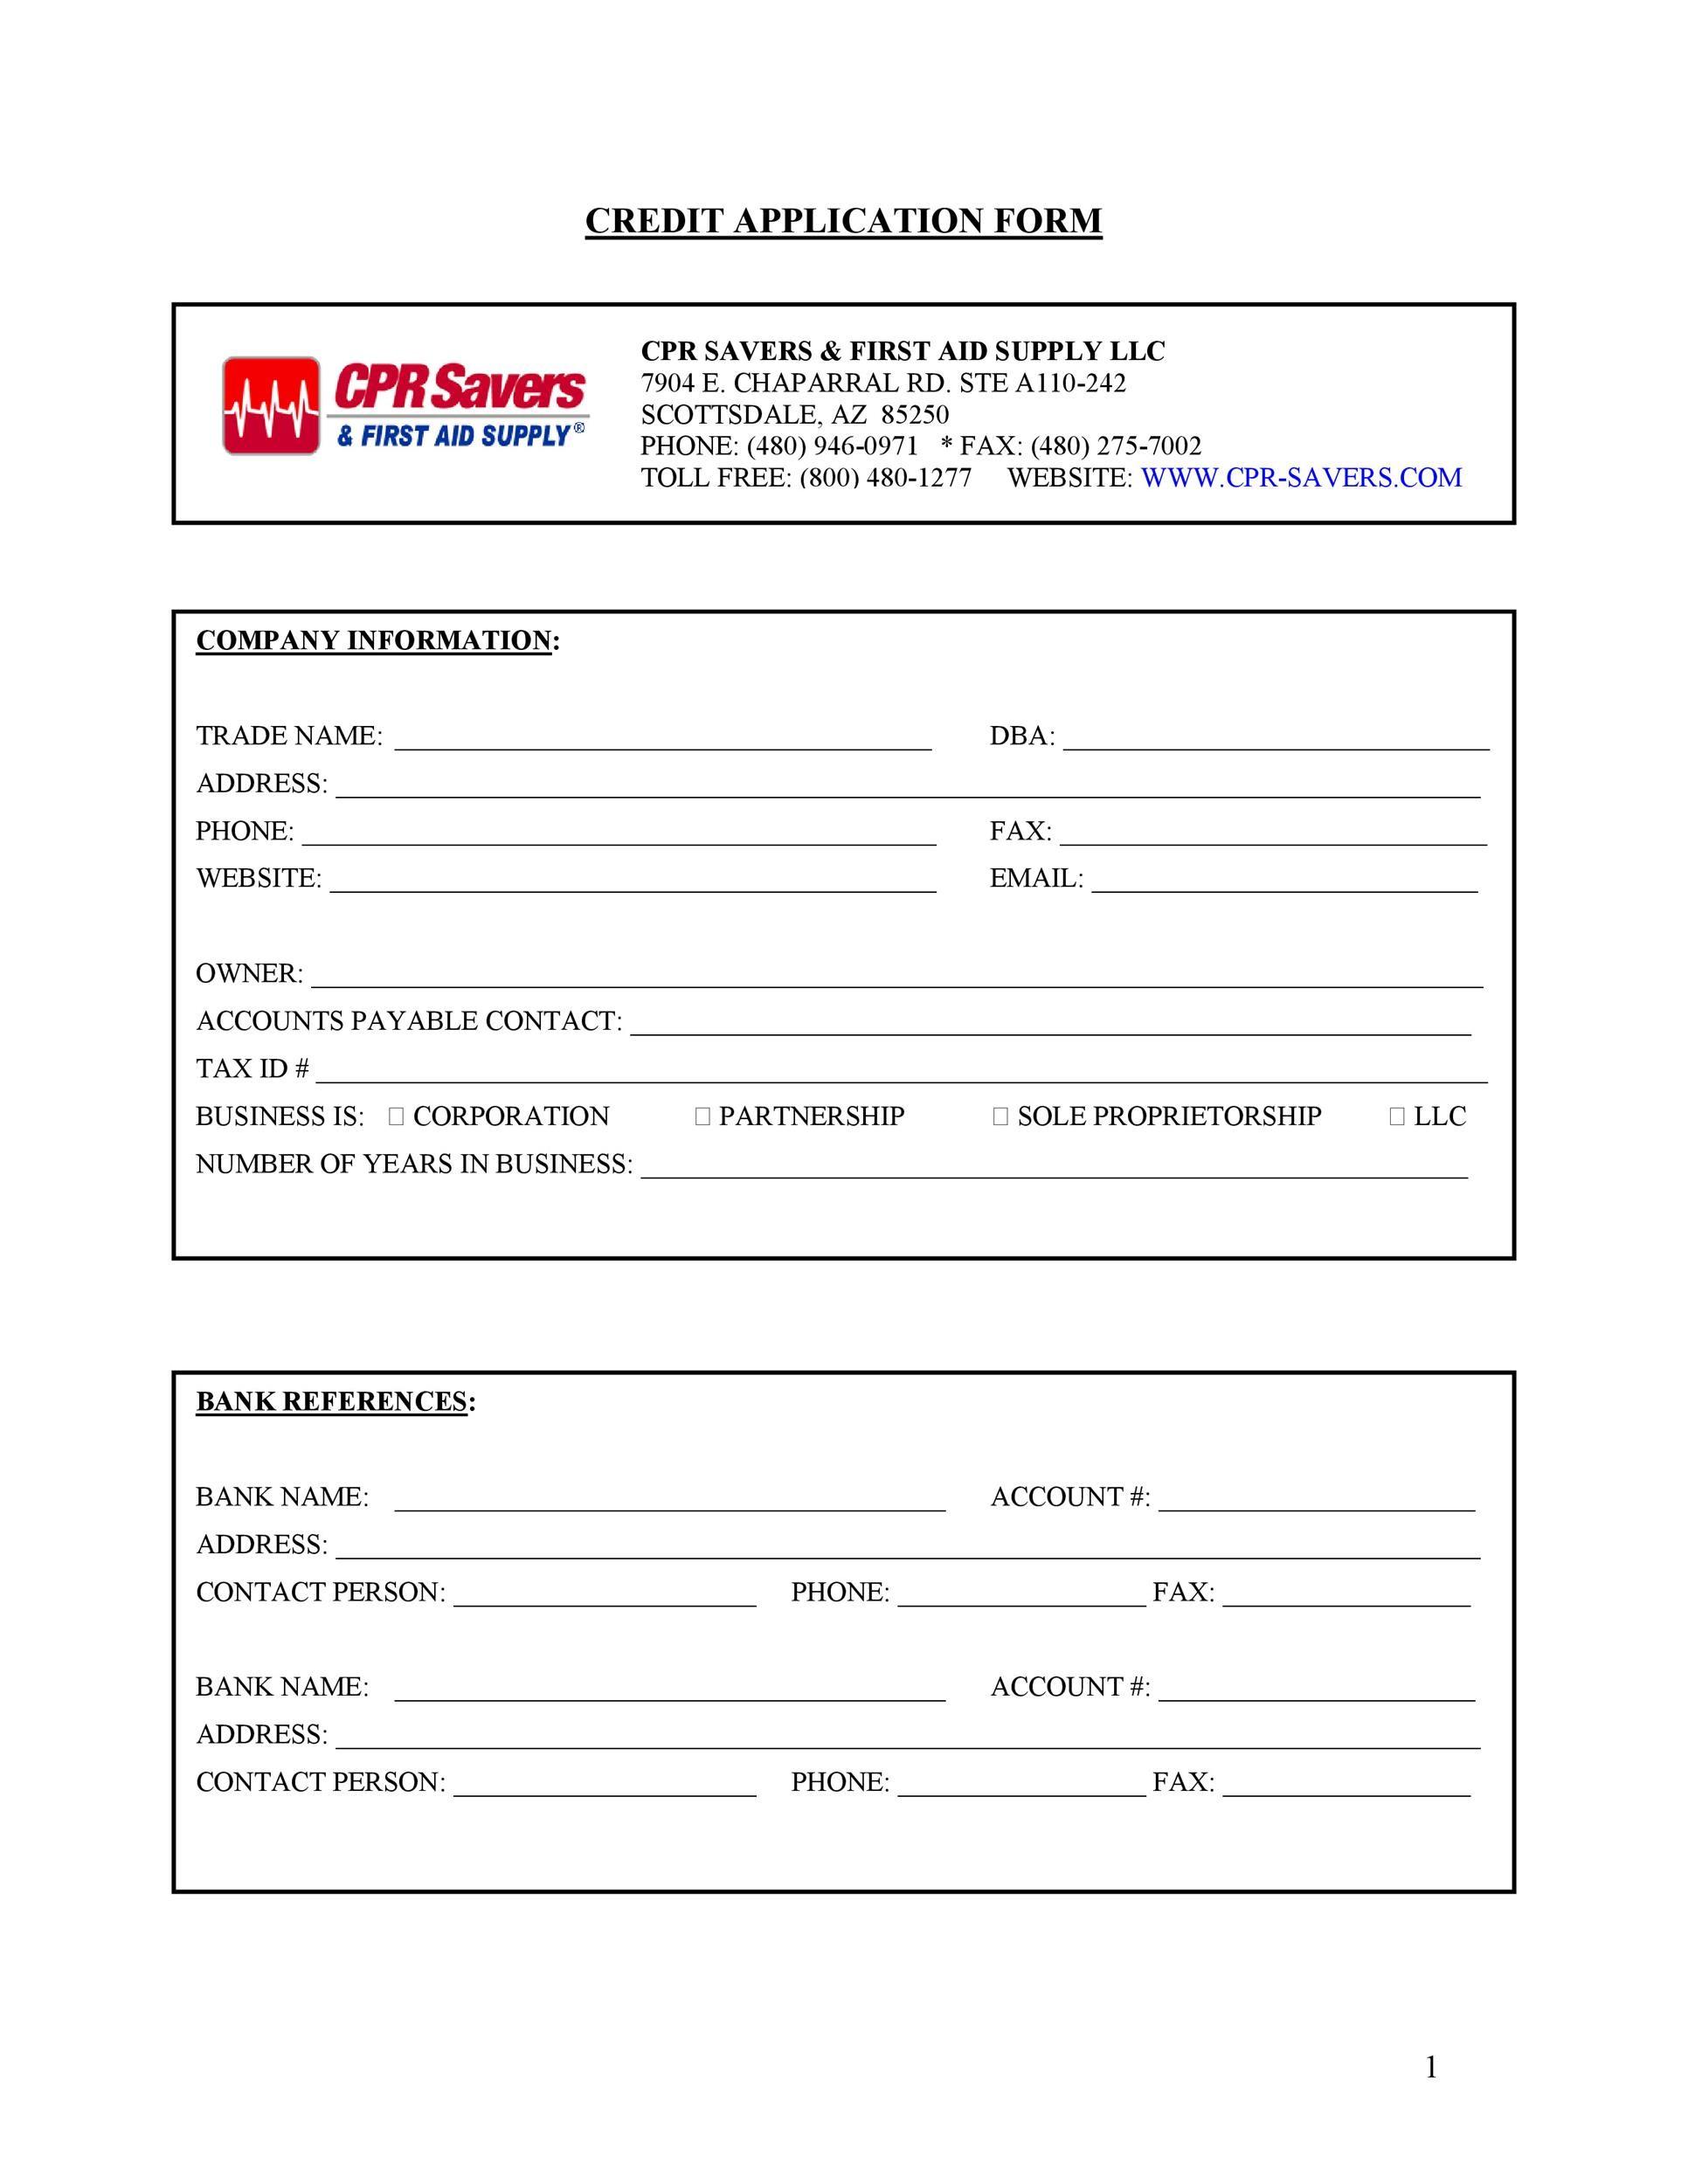 40 free credit application form templates  u0026 samples